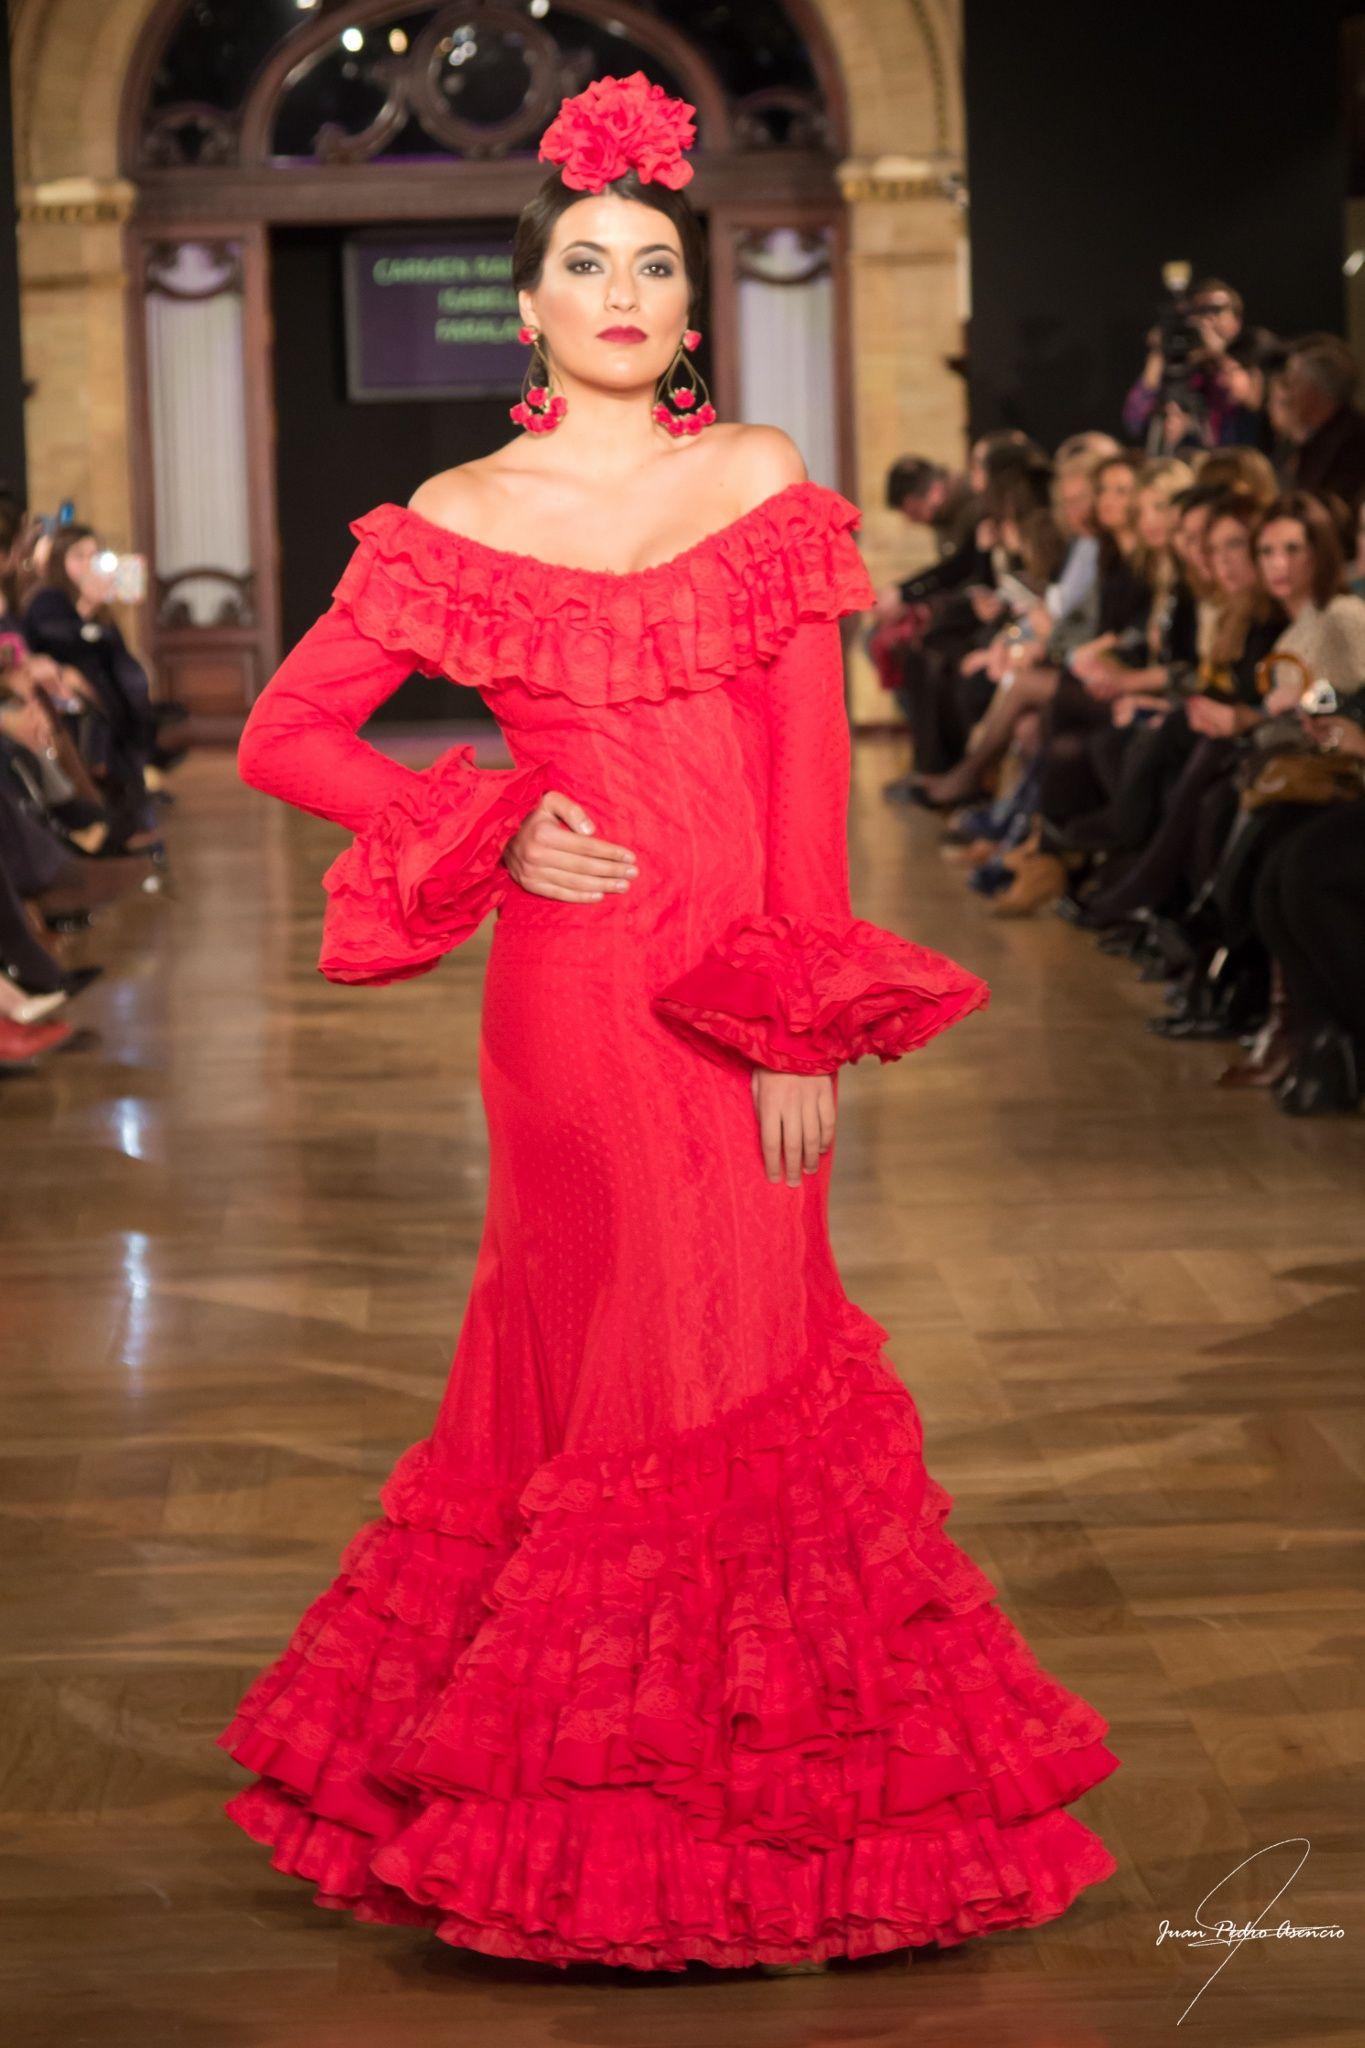 Seville Fashion: We Love Flamenco 2015 (Seville, Fashion). Photographer